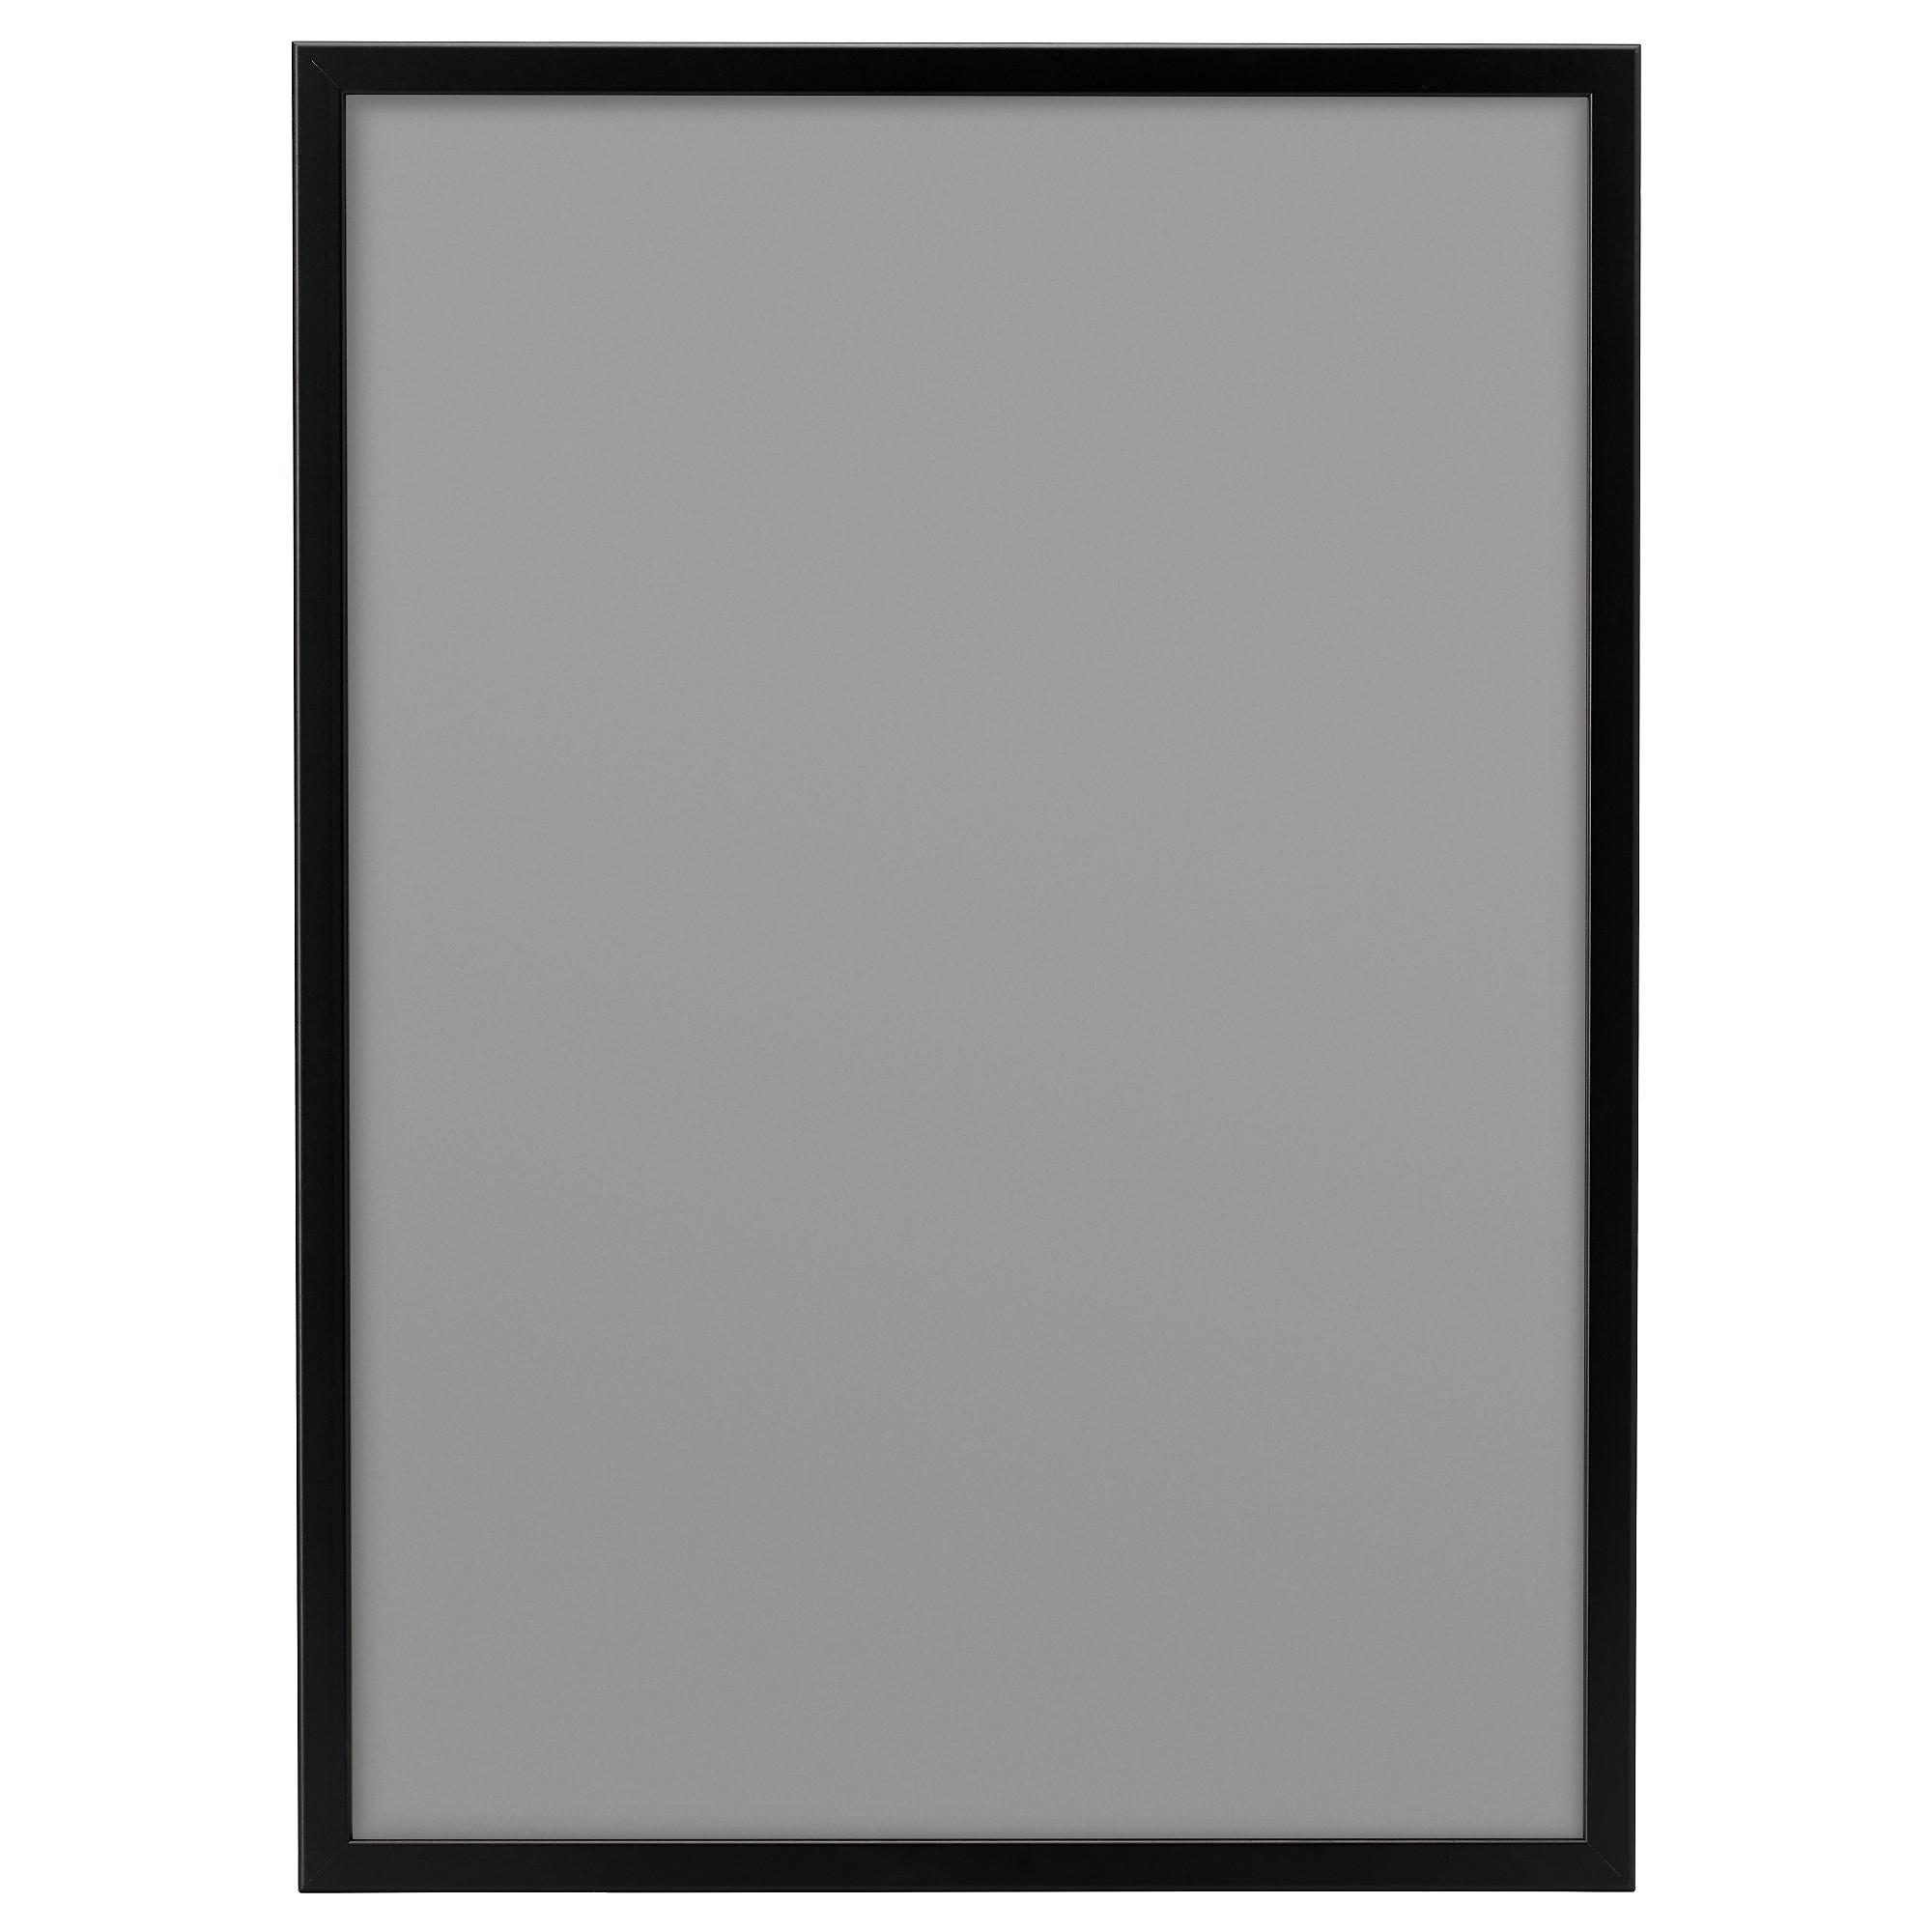 Fiskbo Frame Balck 20x28